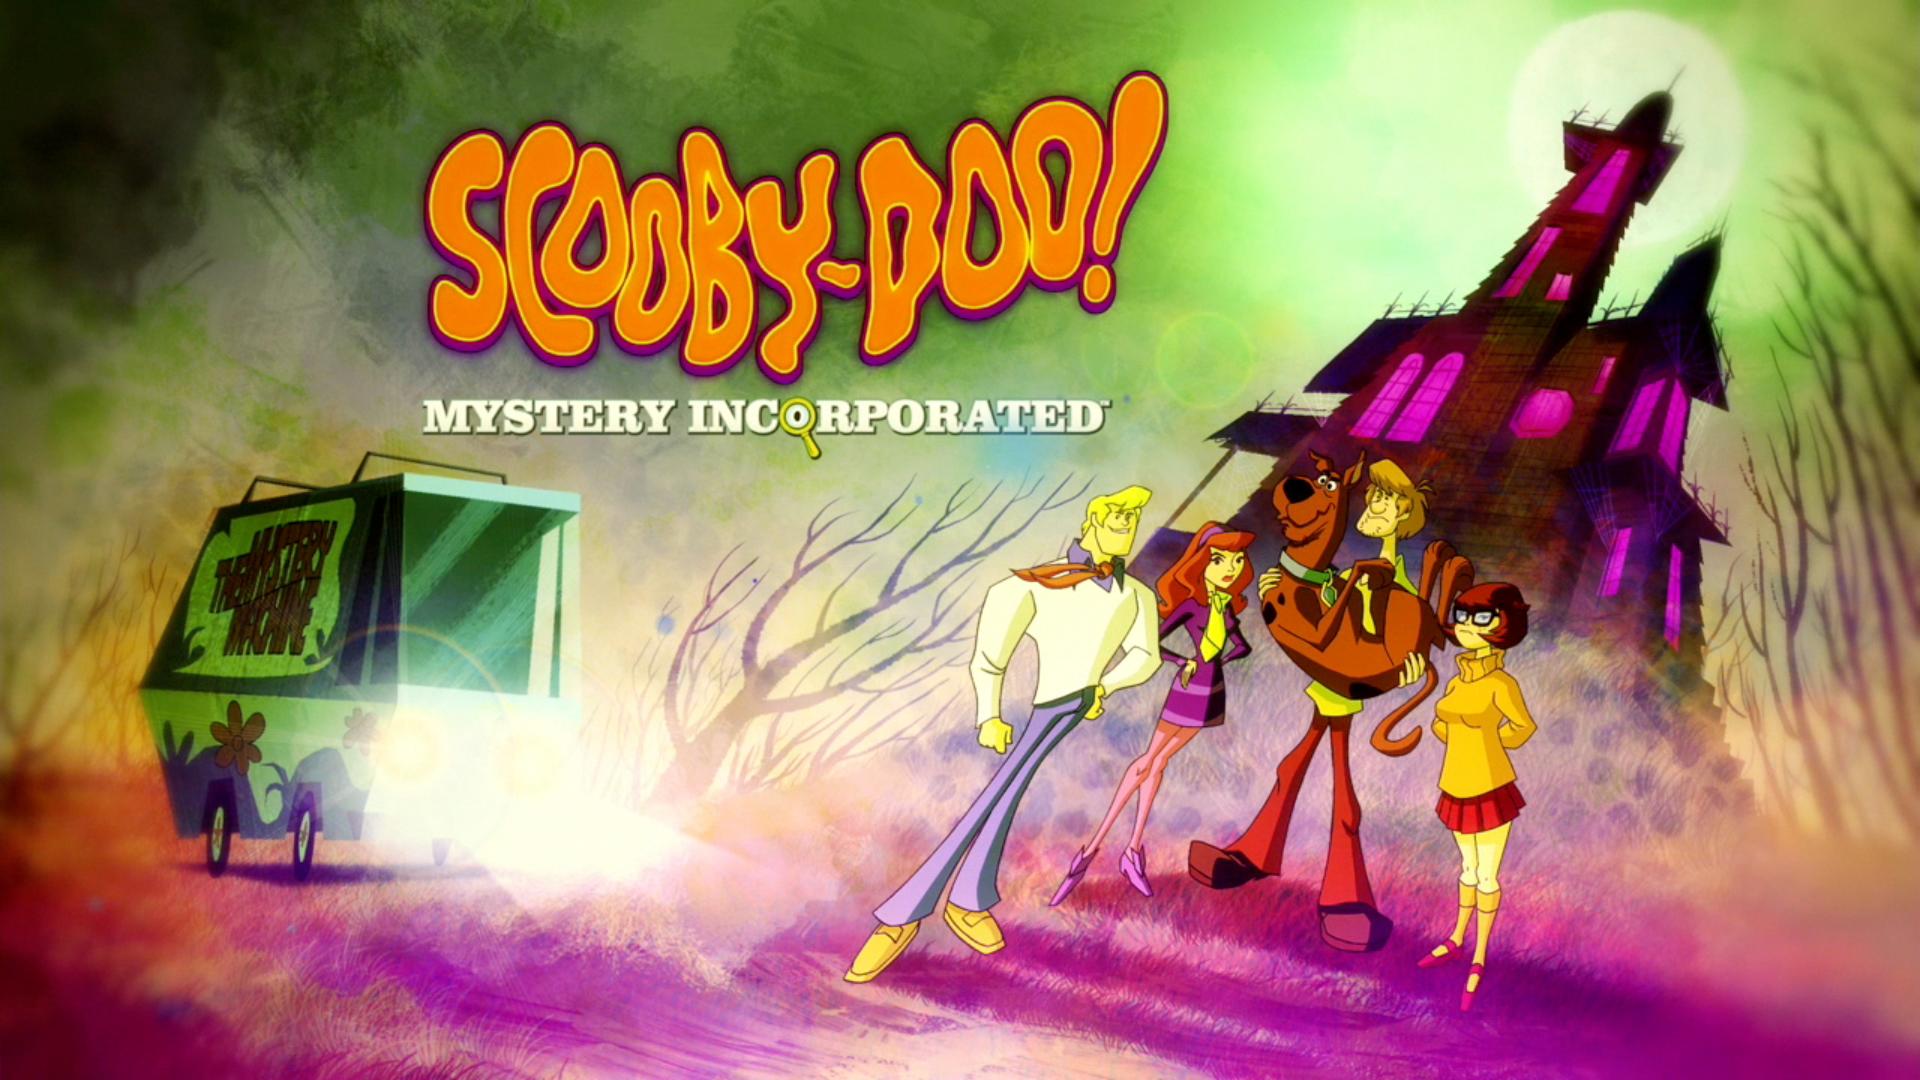 Wonderful Wallpaper Halloween Scooby Doo - latest?cb\u003d20140830181806  Image_426614.png/revision/latest?cb\u003d20140830181806